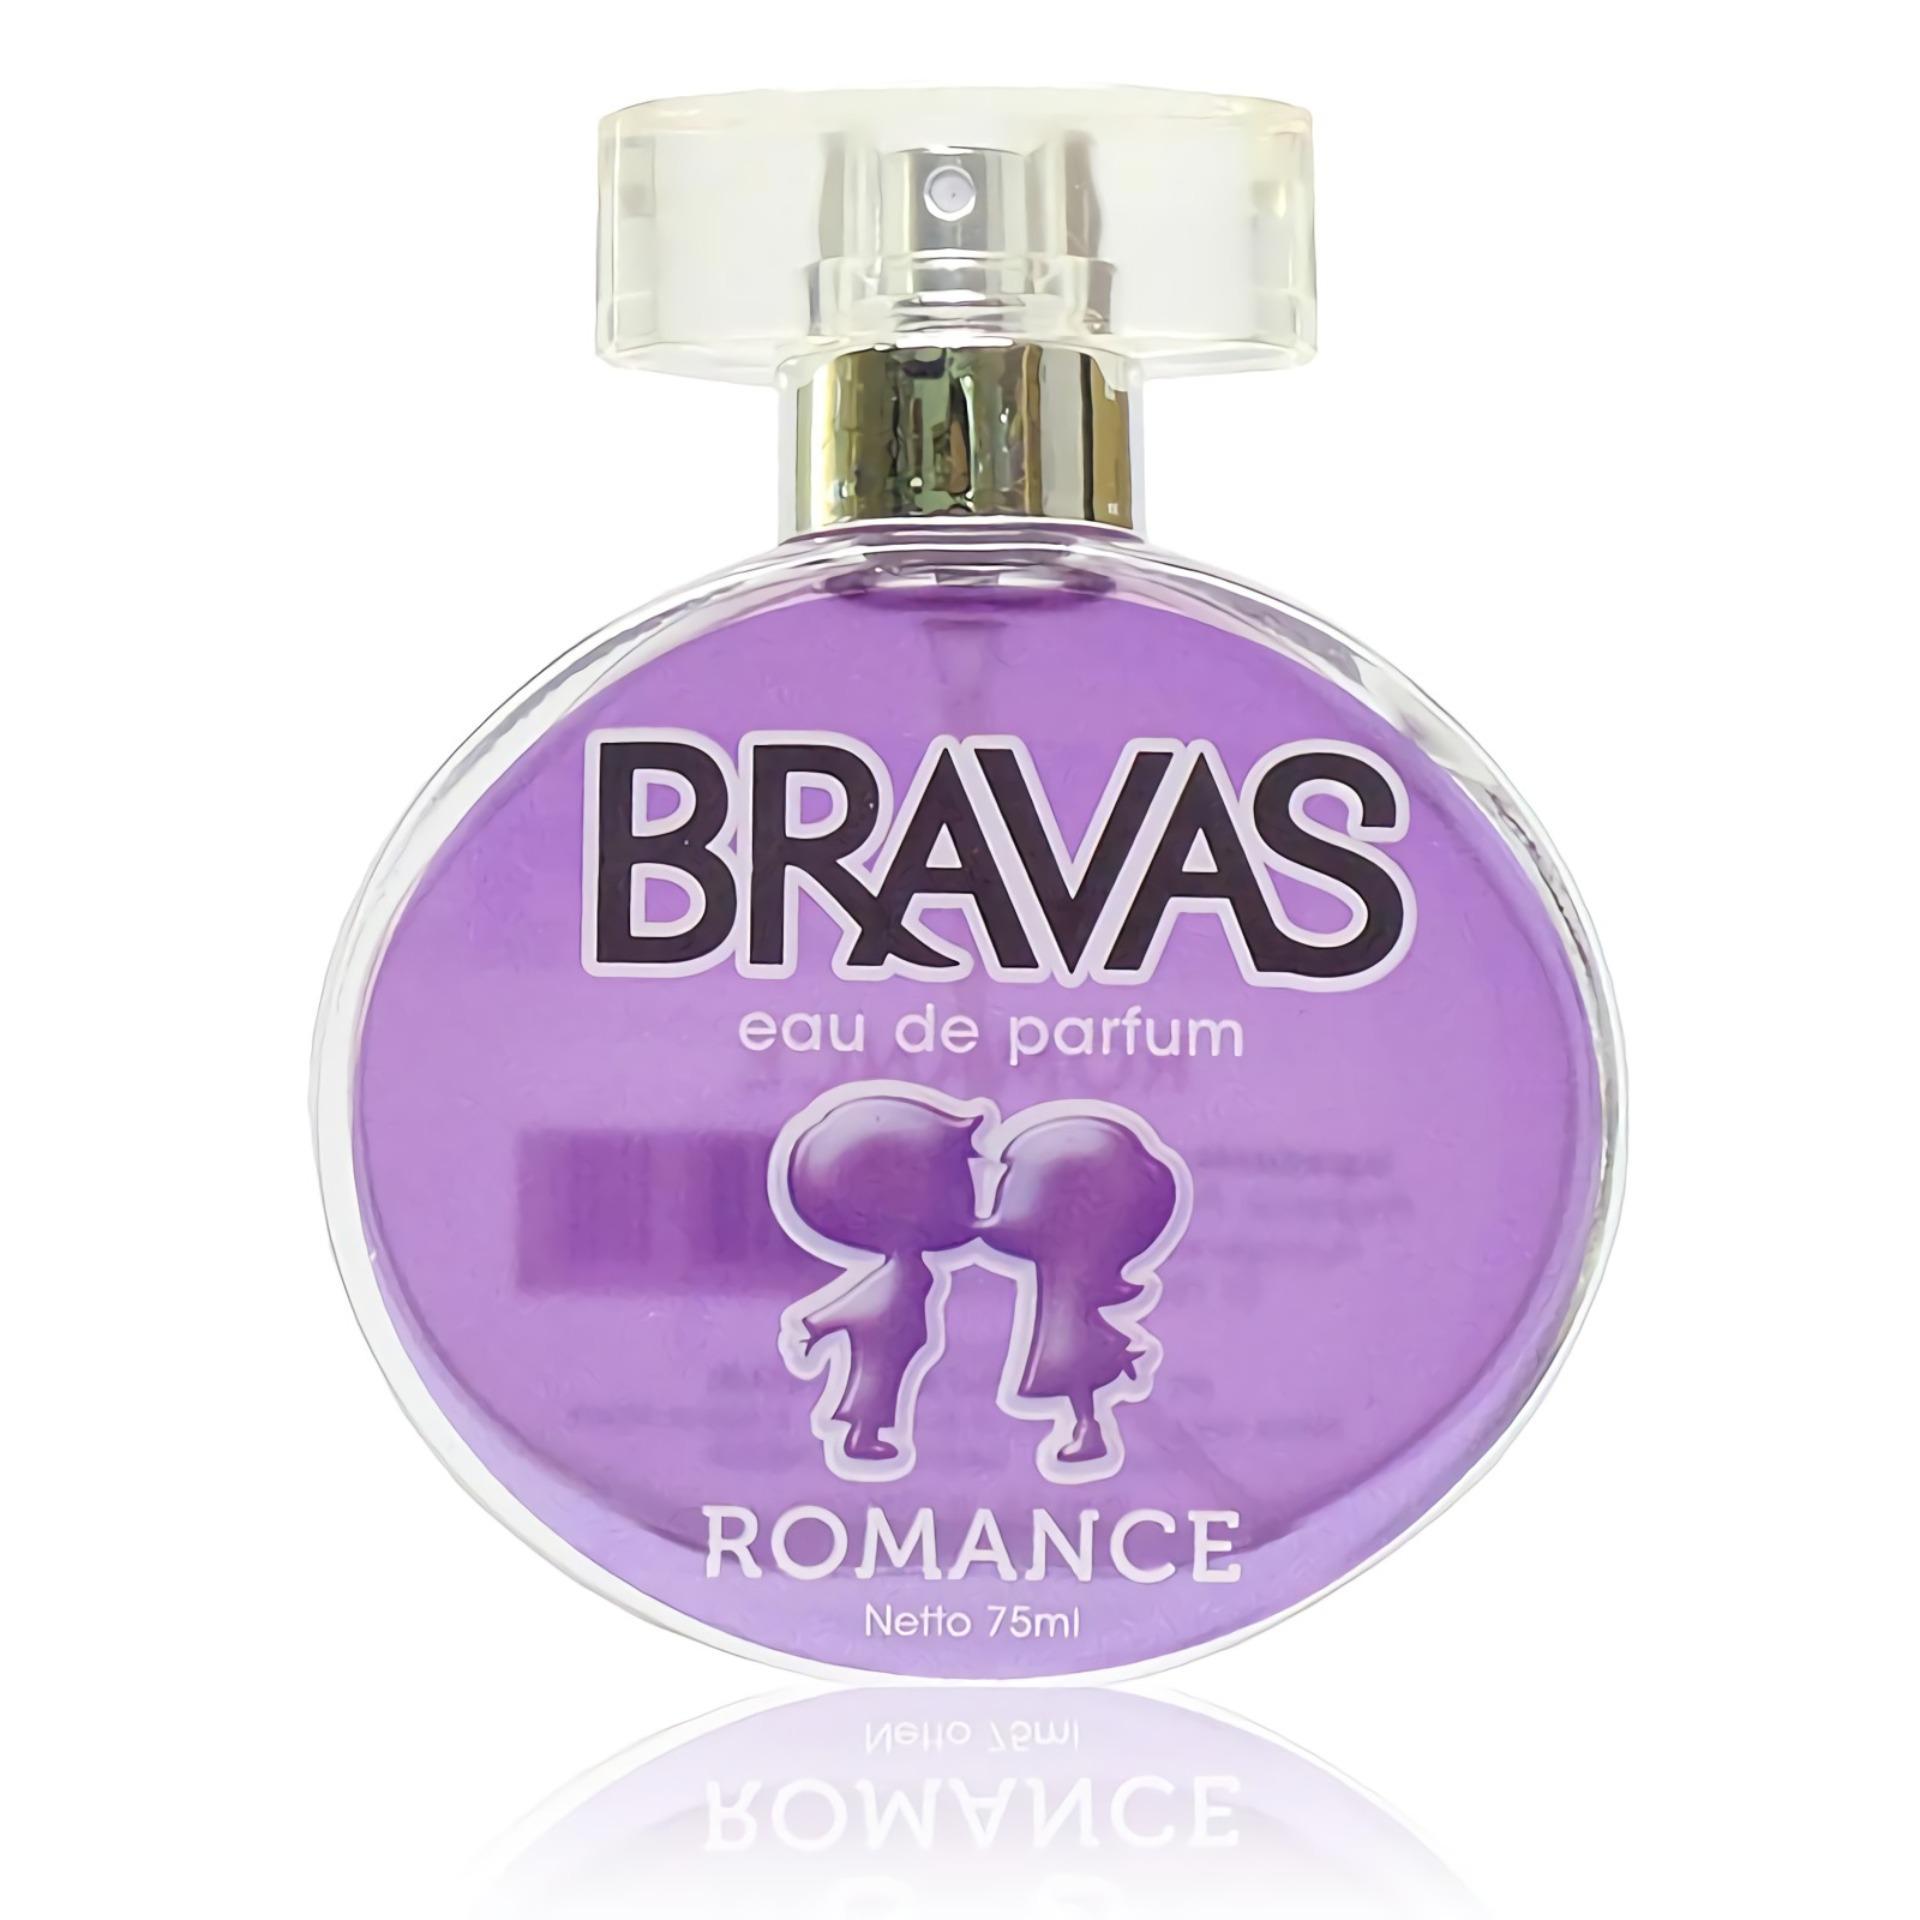 Lihat Parfum Bravas Romance Parfume Eau De 75 Ml Ungu Dan Zwitsbaby Original Perfume Xx Ct 670149